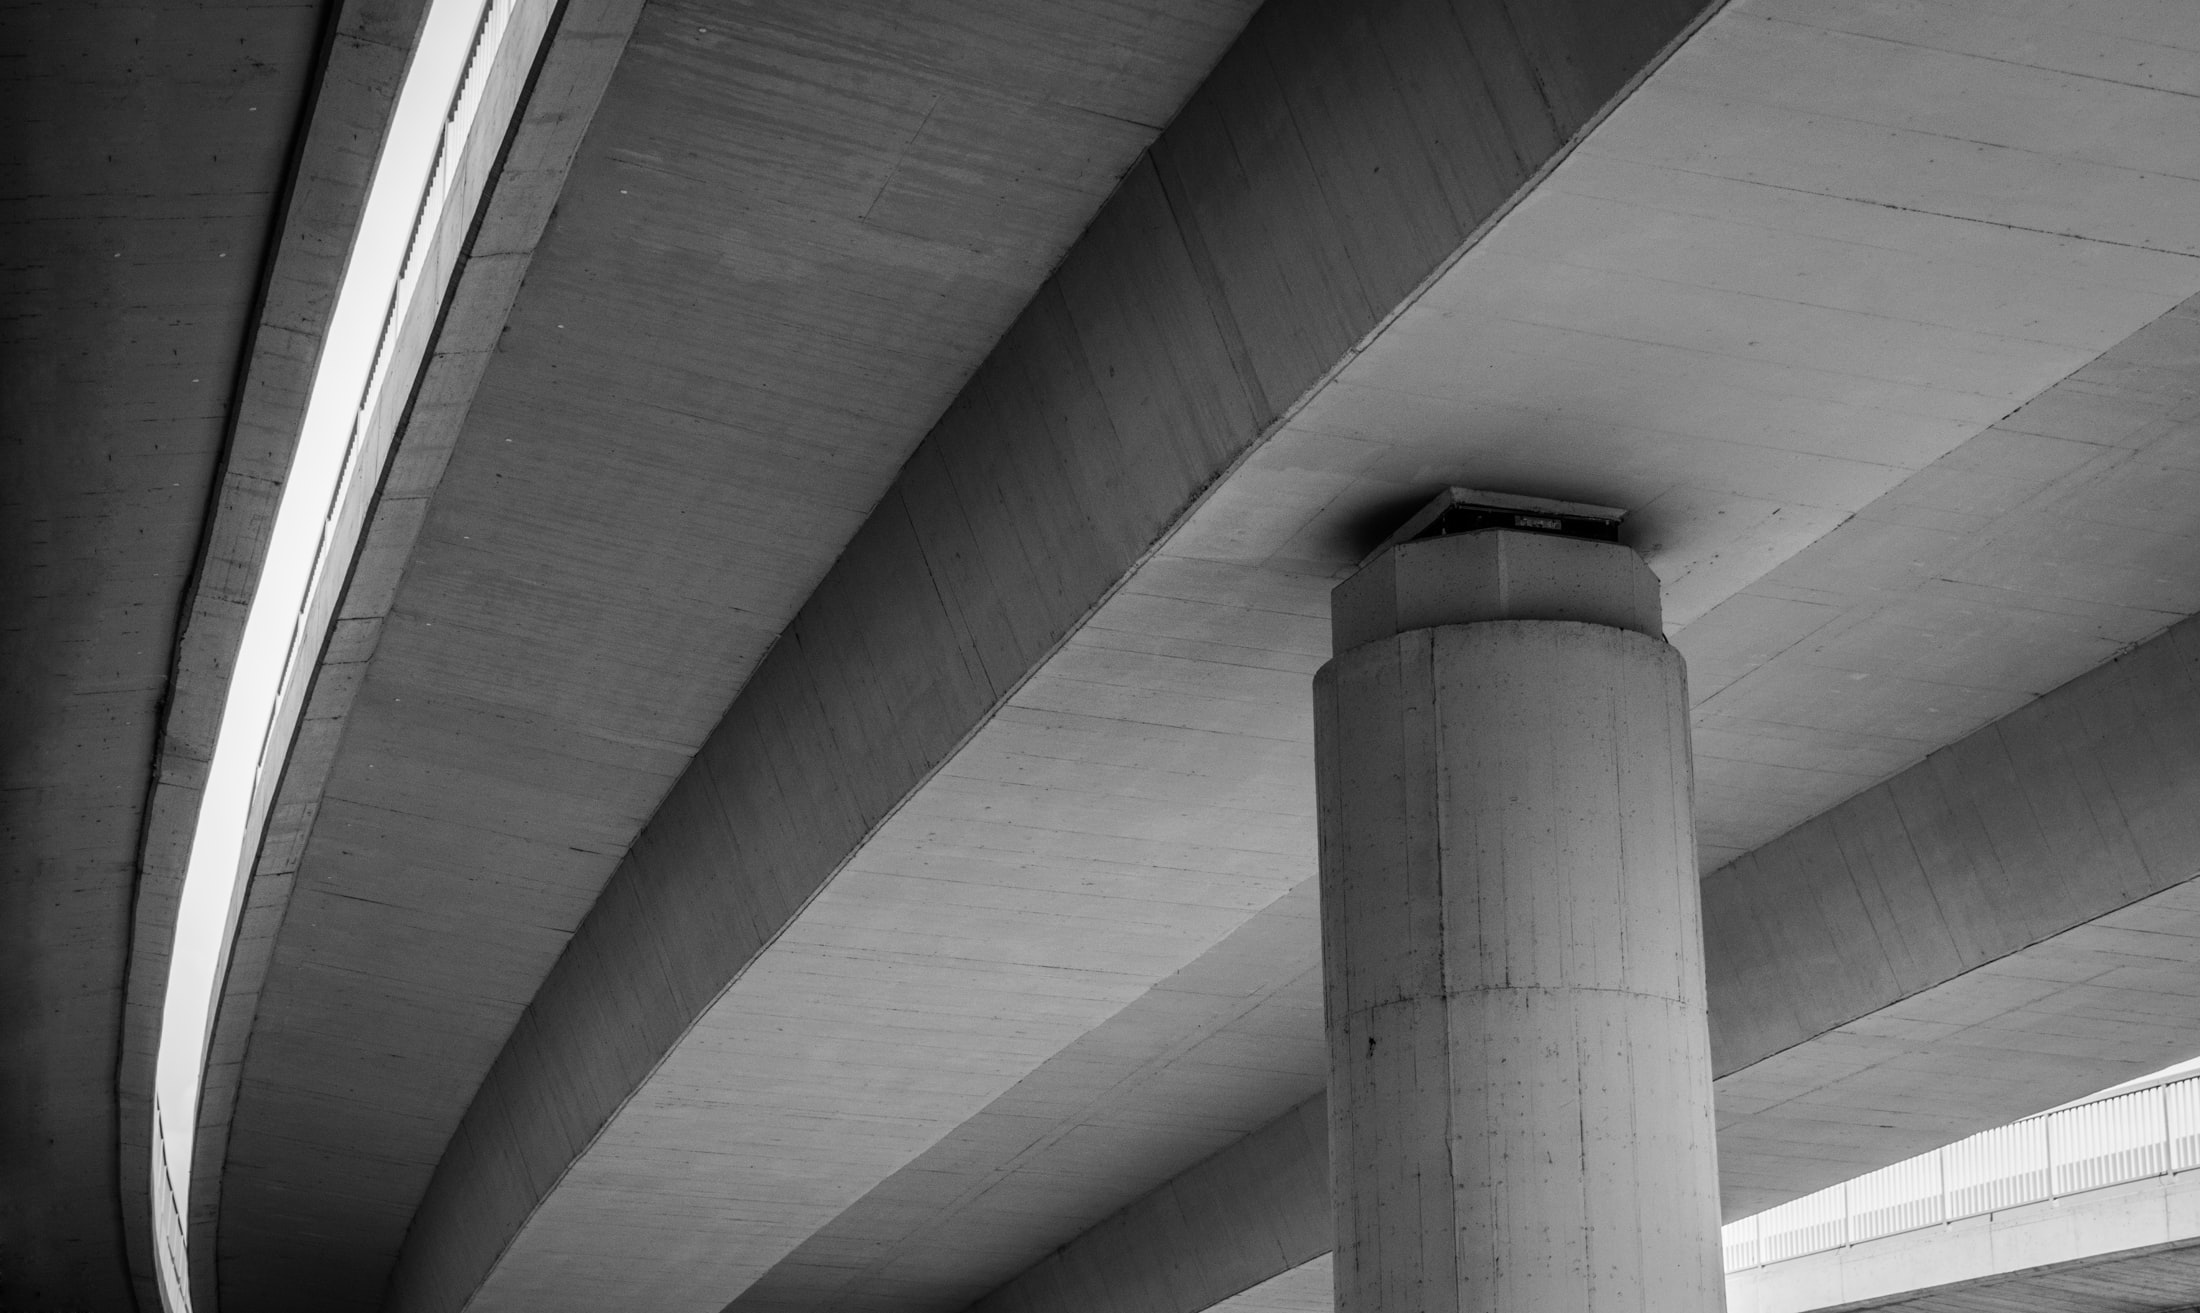 gray overpass road